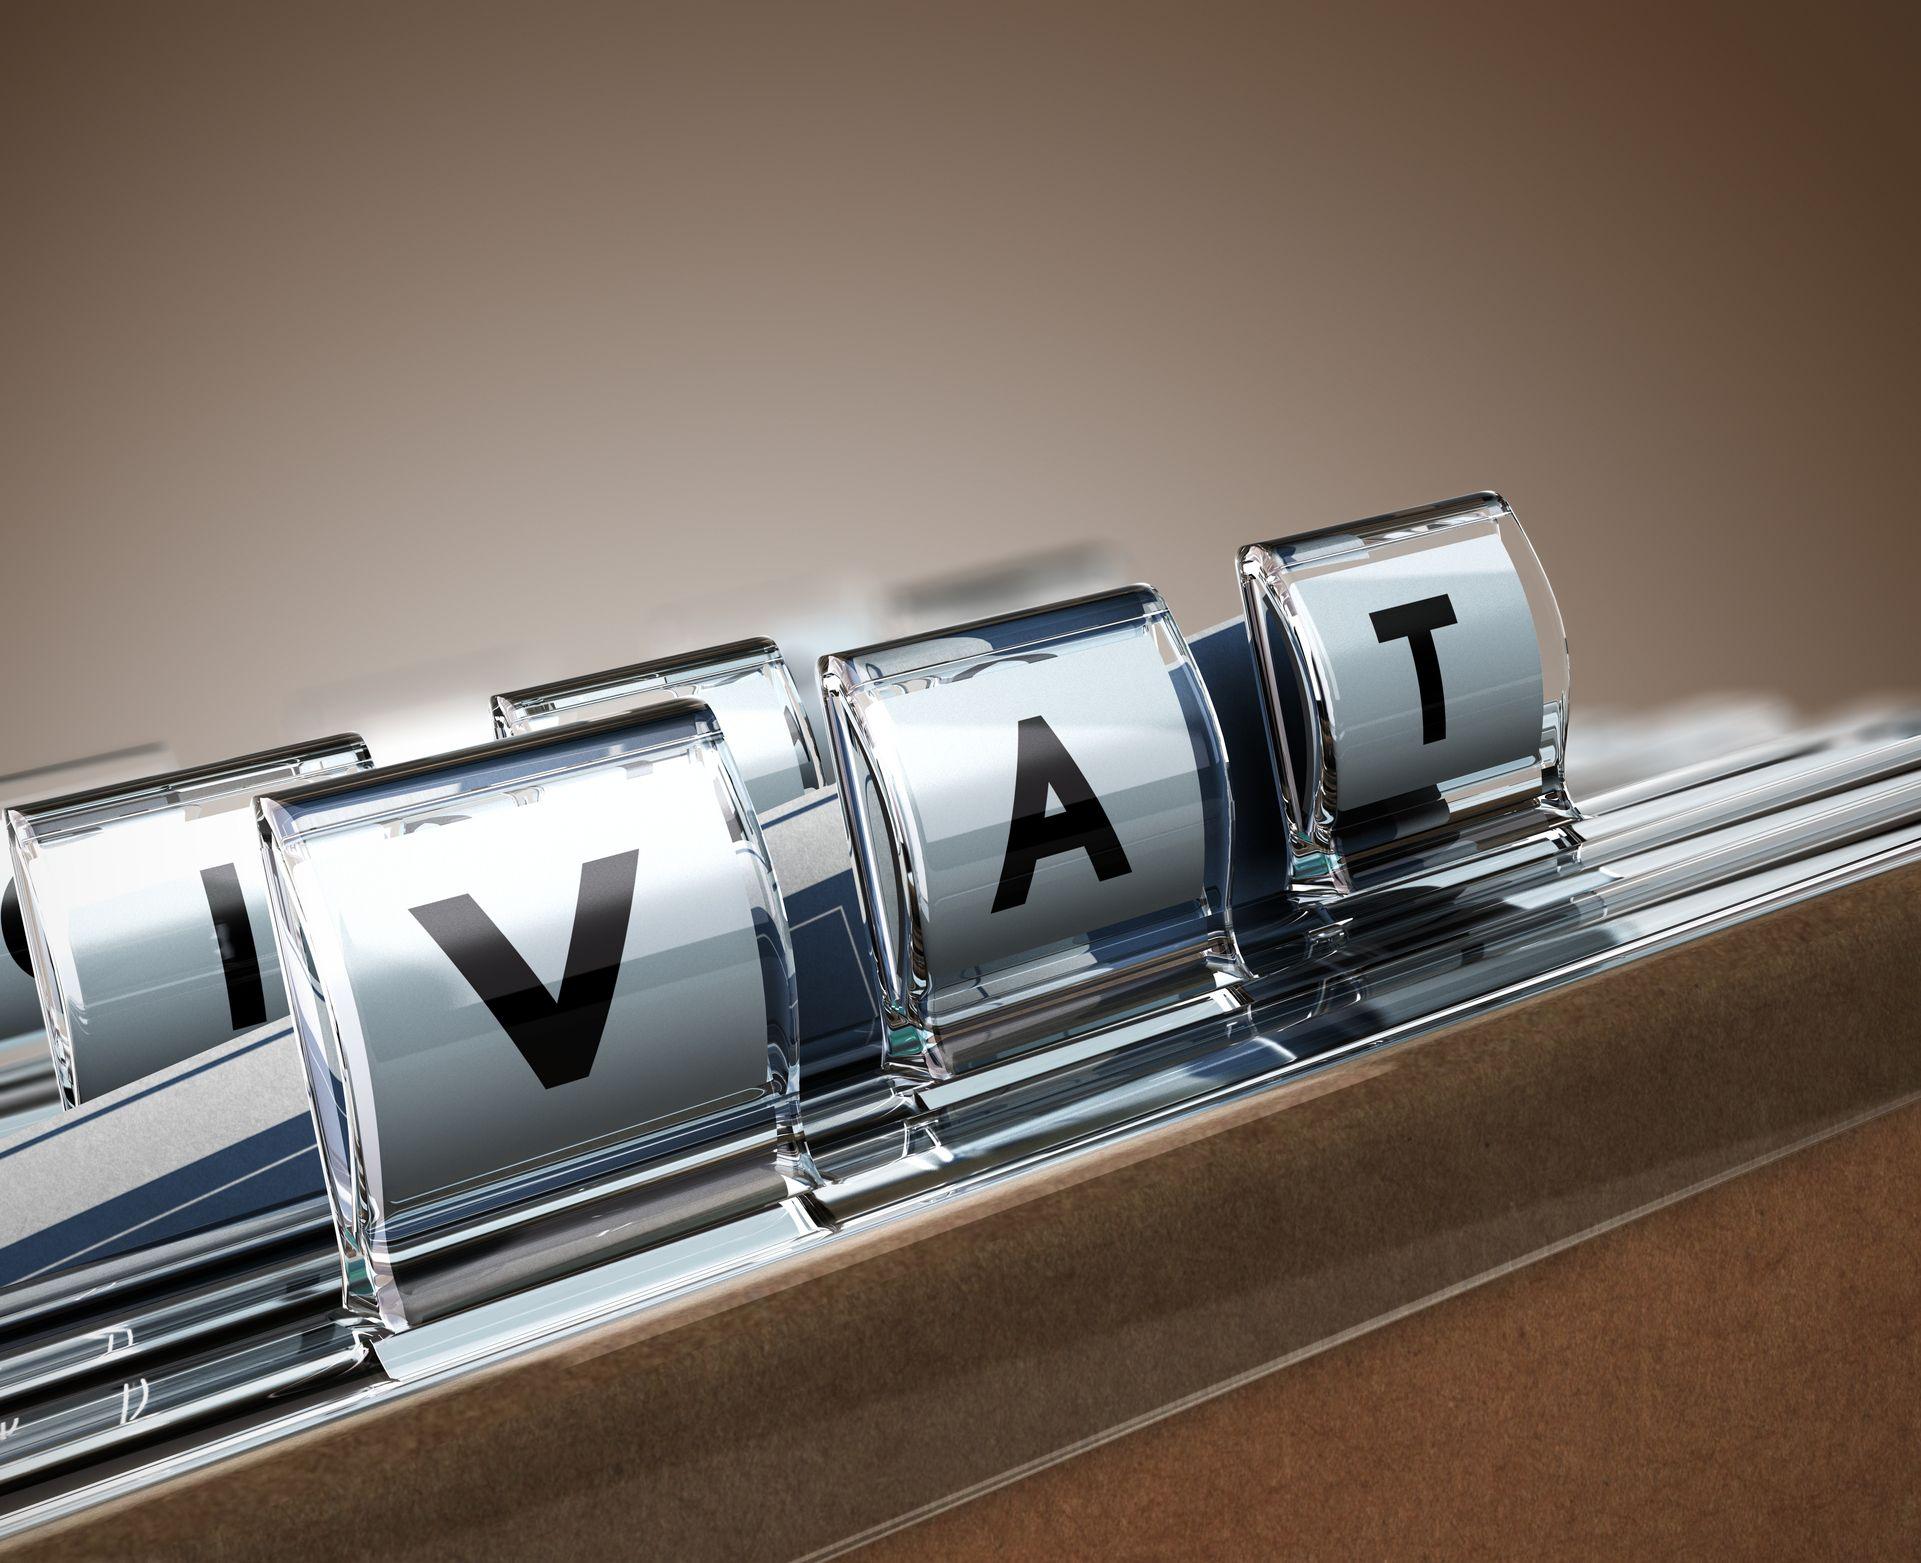 JPK_VAT a faktury bez lub z częściowym prawem odliczenia VAT